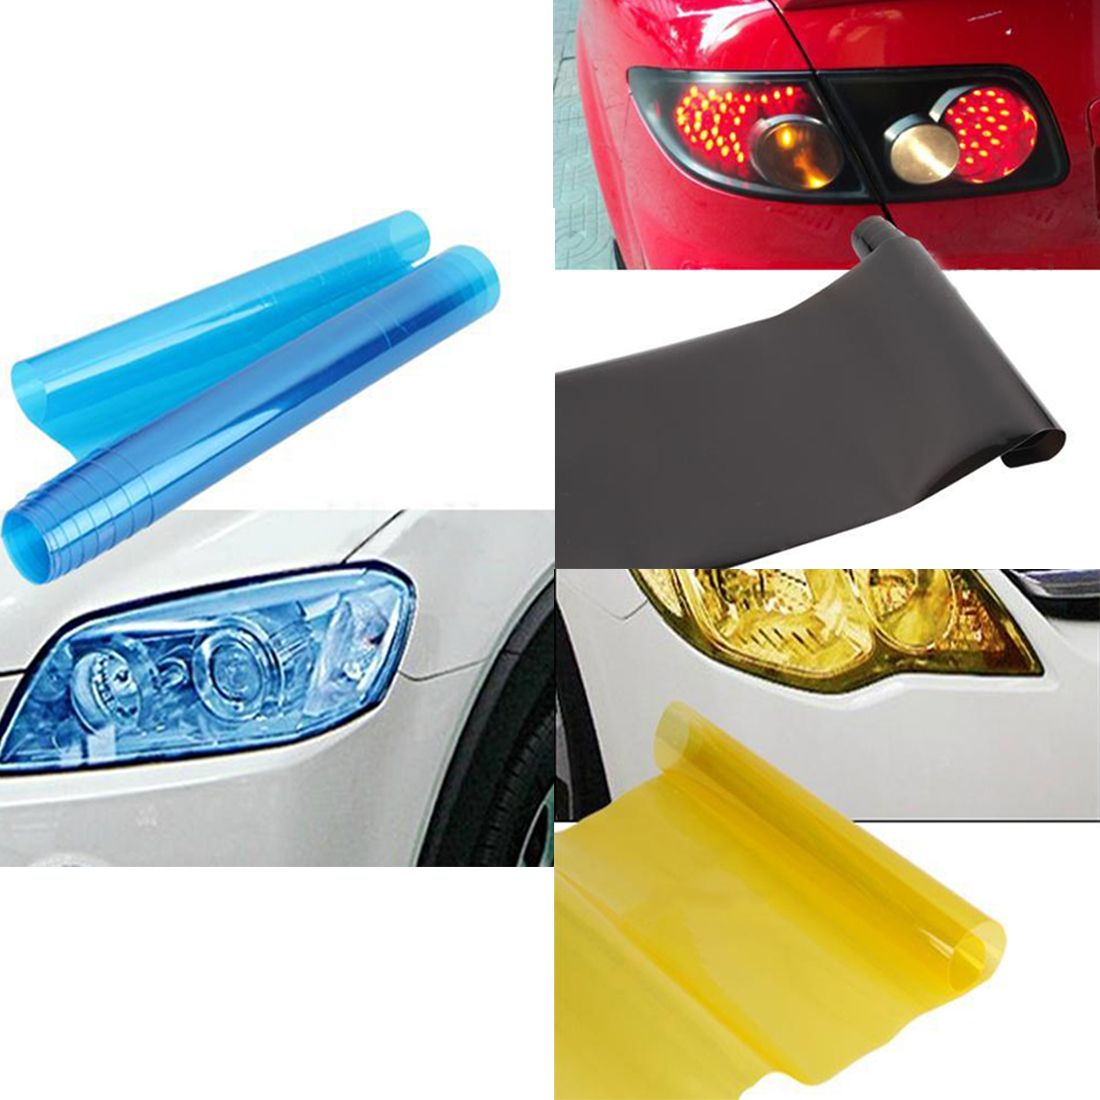 Hot Sale 30cm X 120cm 3 Color Auto Car Tint Headlight Taillight Fog Light Vinyl Smoke Film Sheet Sticker Cover 12inch X Tail Light Motorbike Accessories Vinyl [ 1100 x 1100 Pixel ]